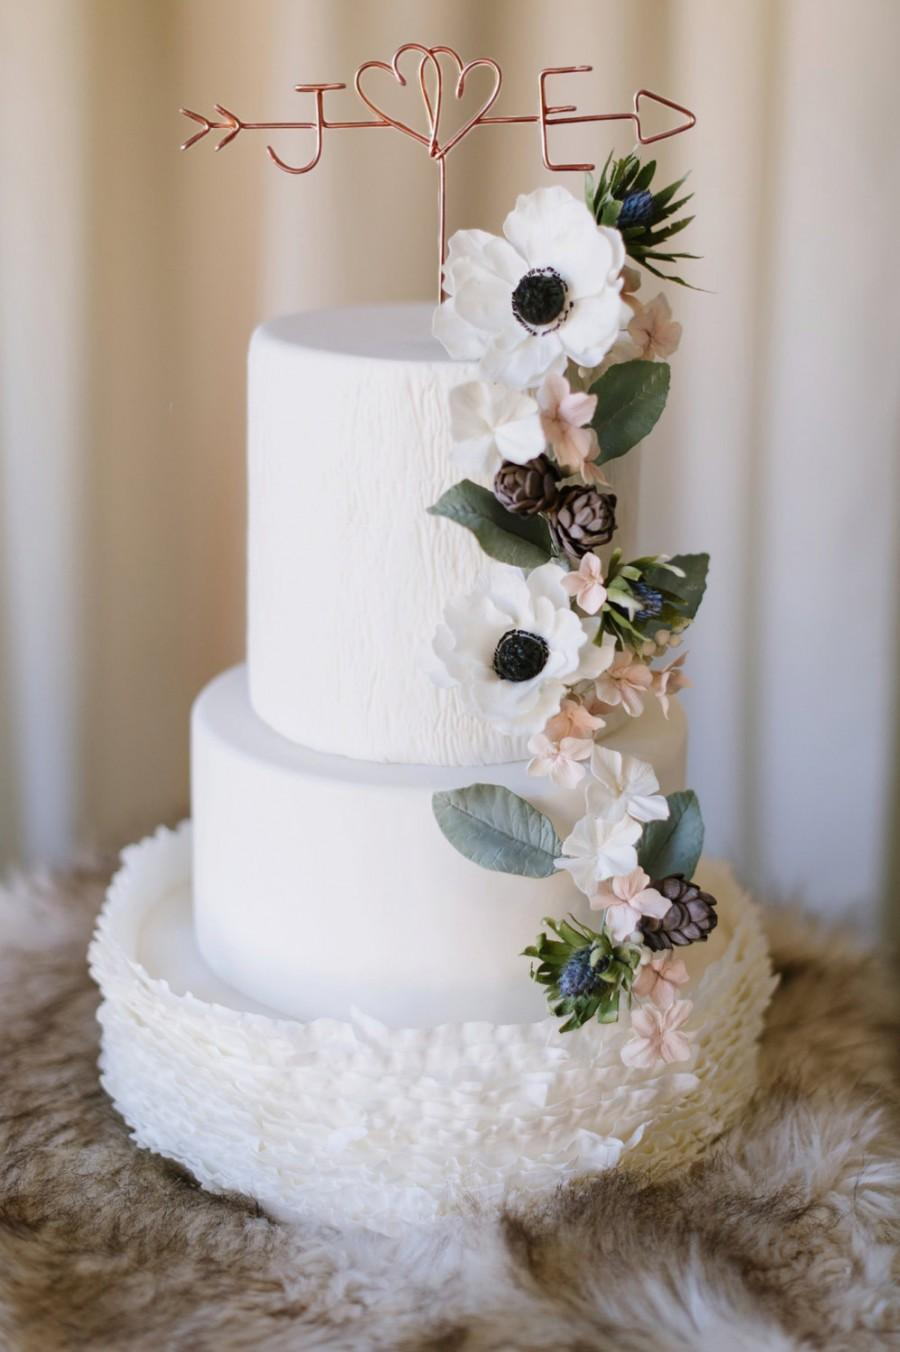 زفاف - Twin Hearts - Rustic Cake Topper - Wire Cake Topper - Arrow & Initials Cake Topper - Personalized Cake Topper - Rustic Chic - Wedding